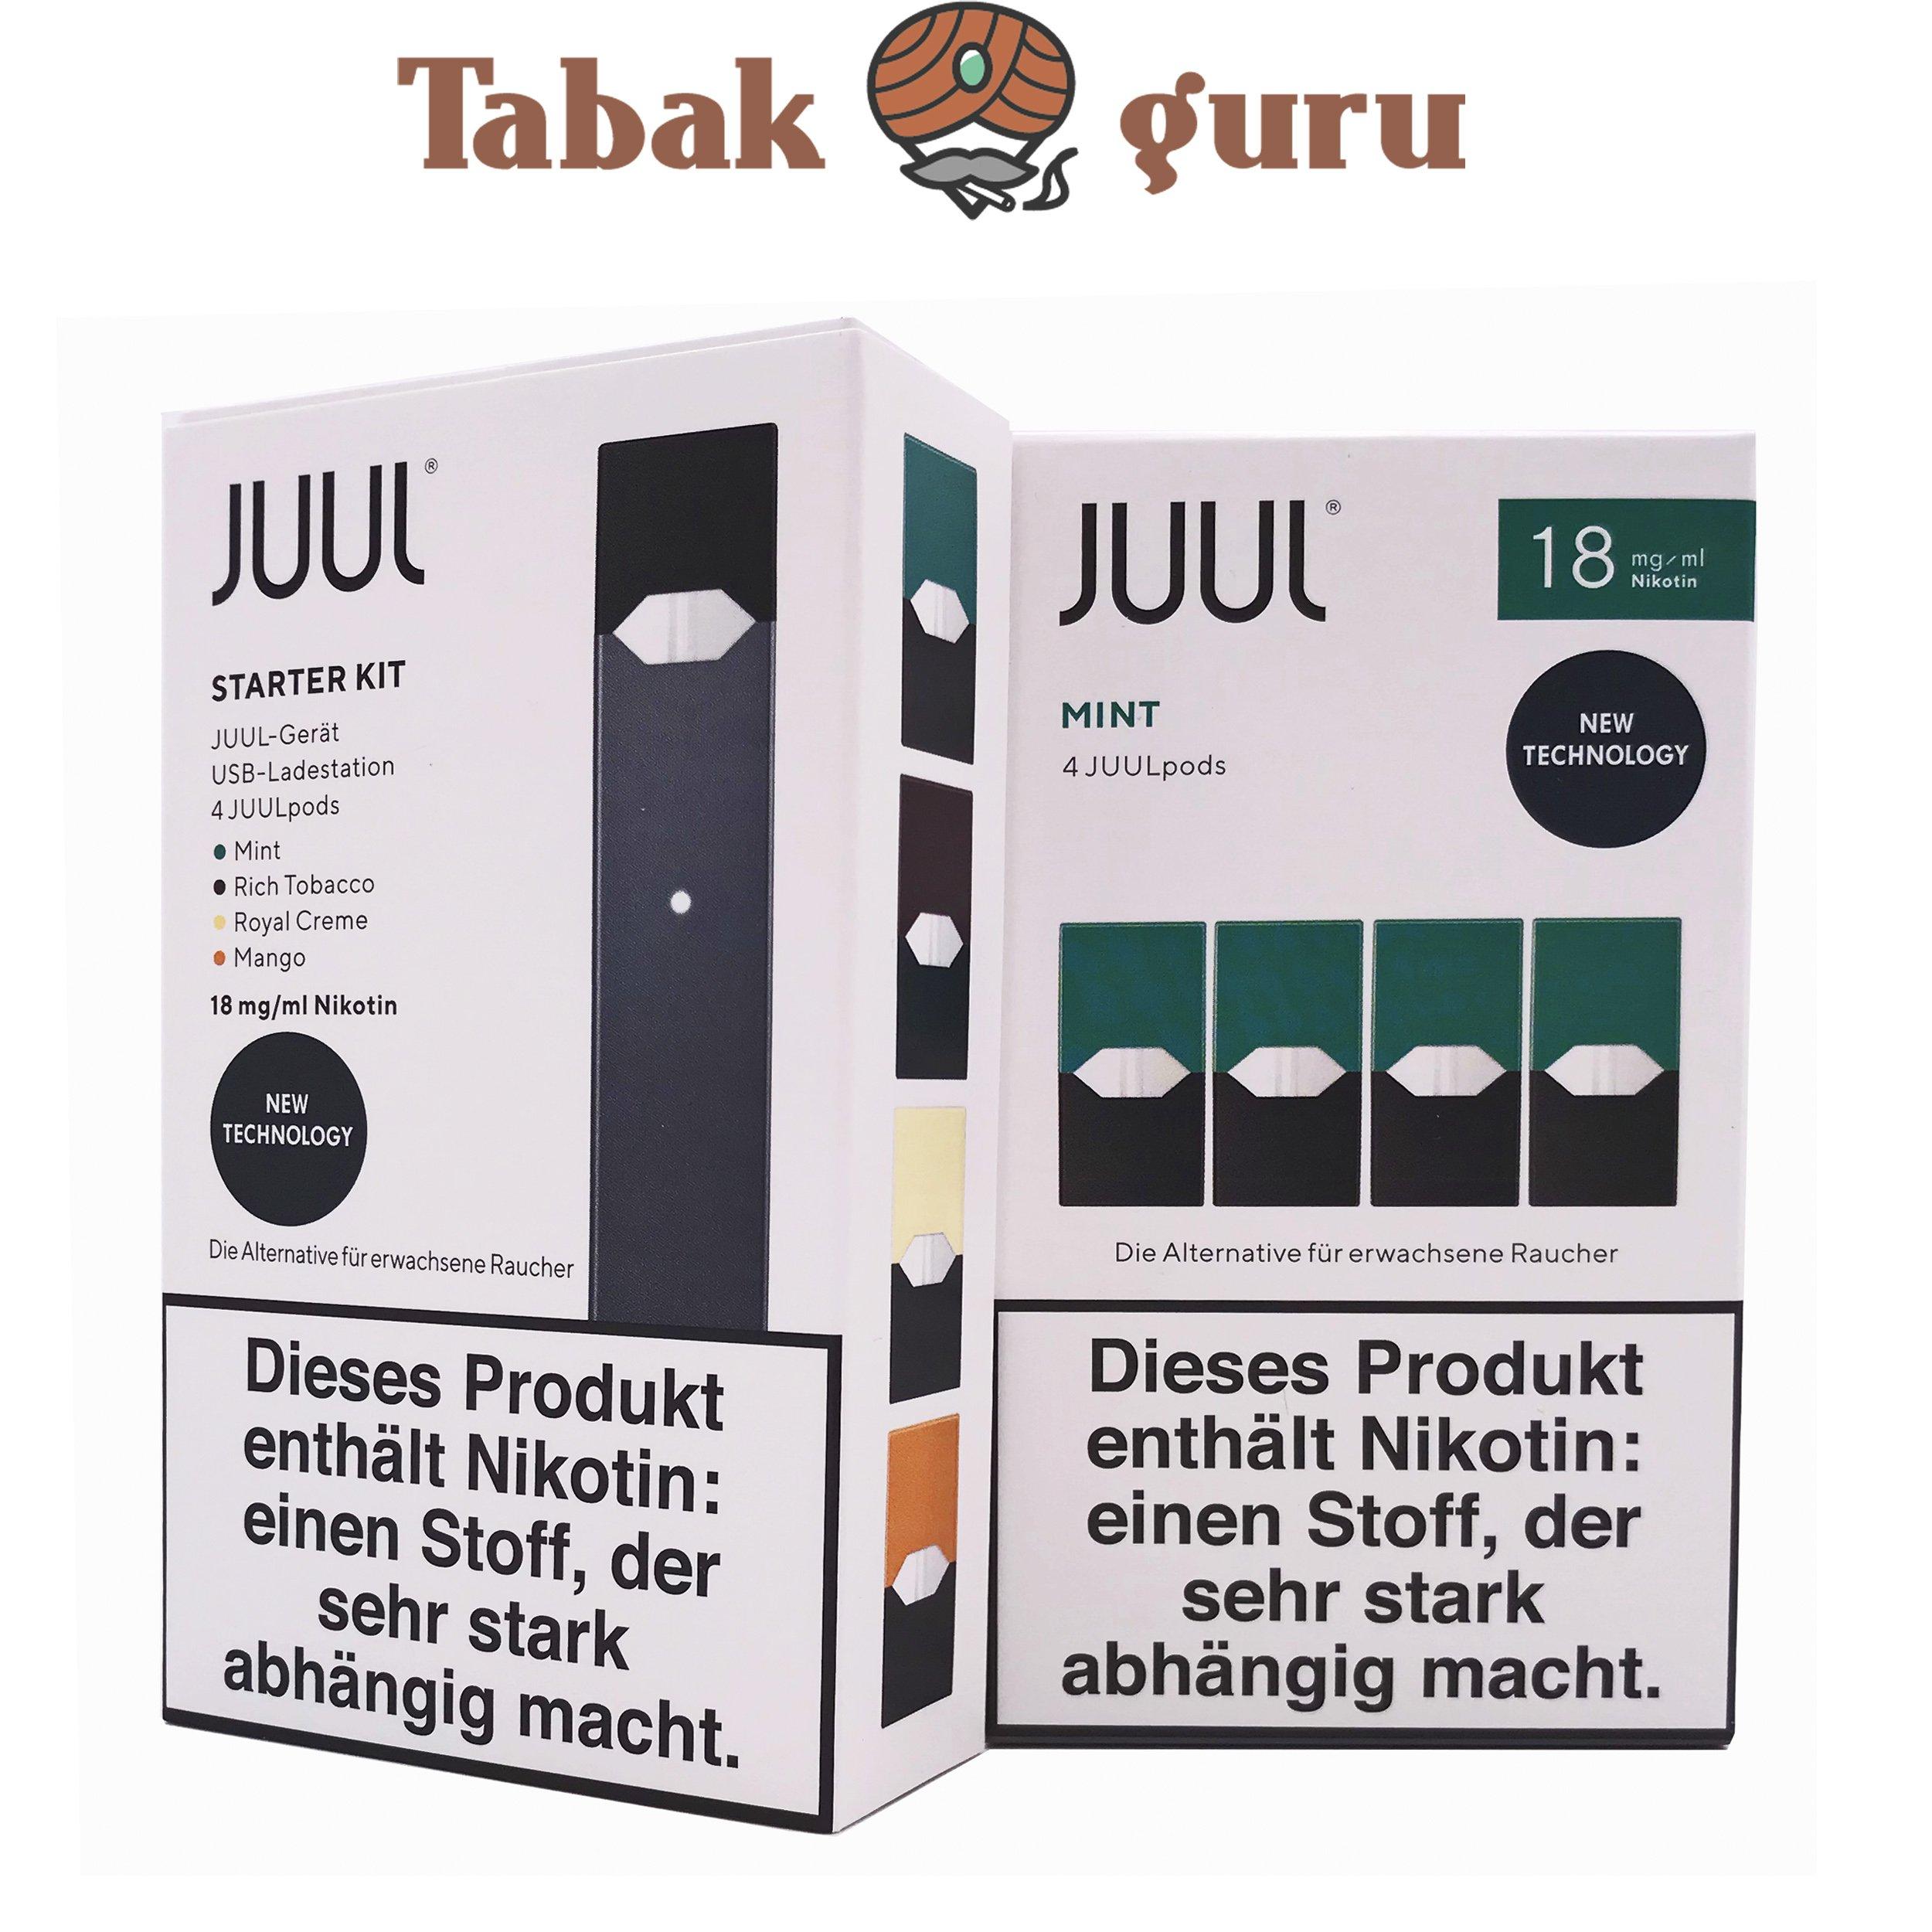 JUUL Starter-Kit mit 4 JUULpods Inkl. 4 JUULpods Mint 18mg